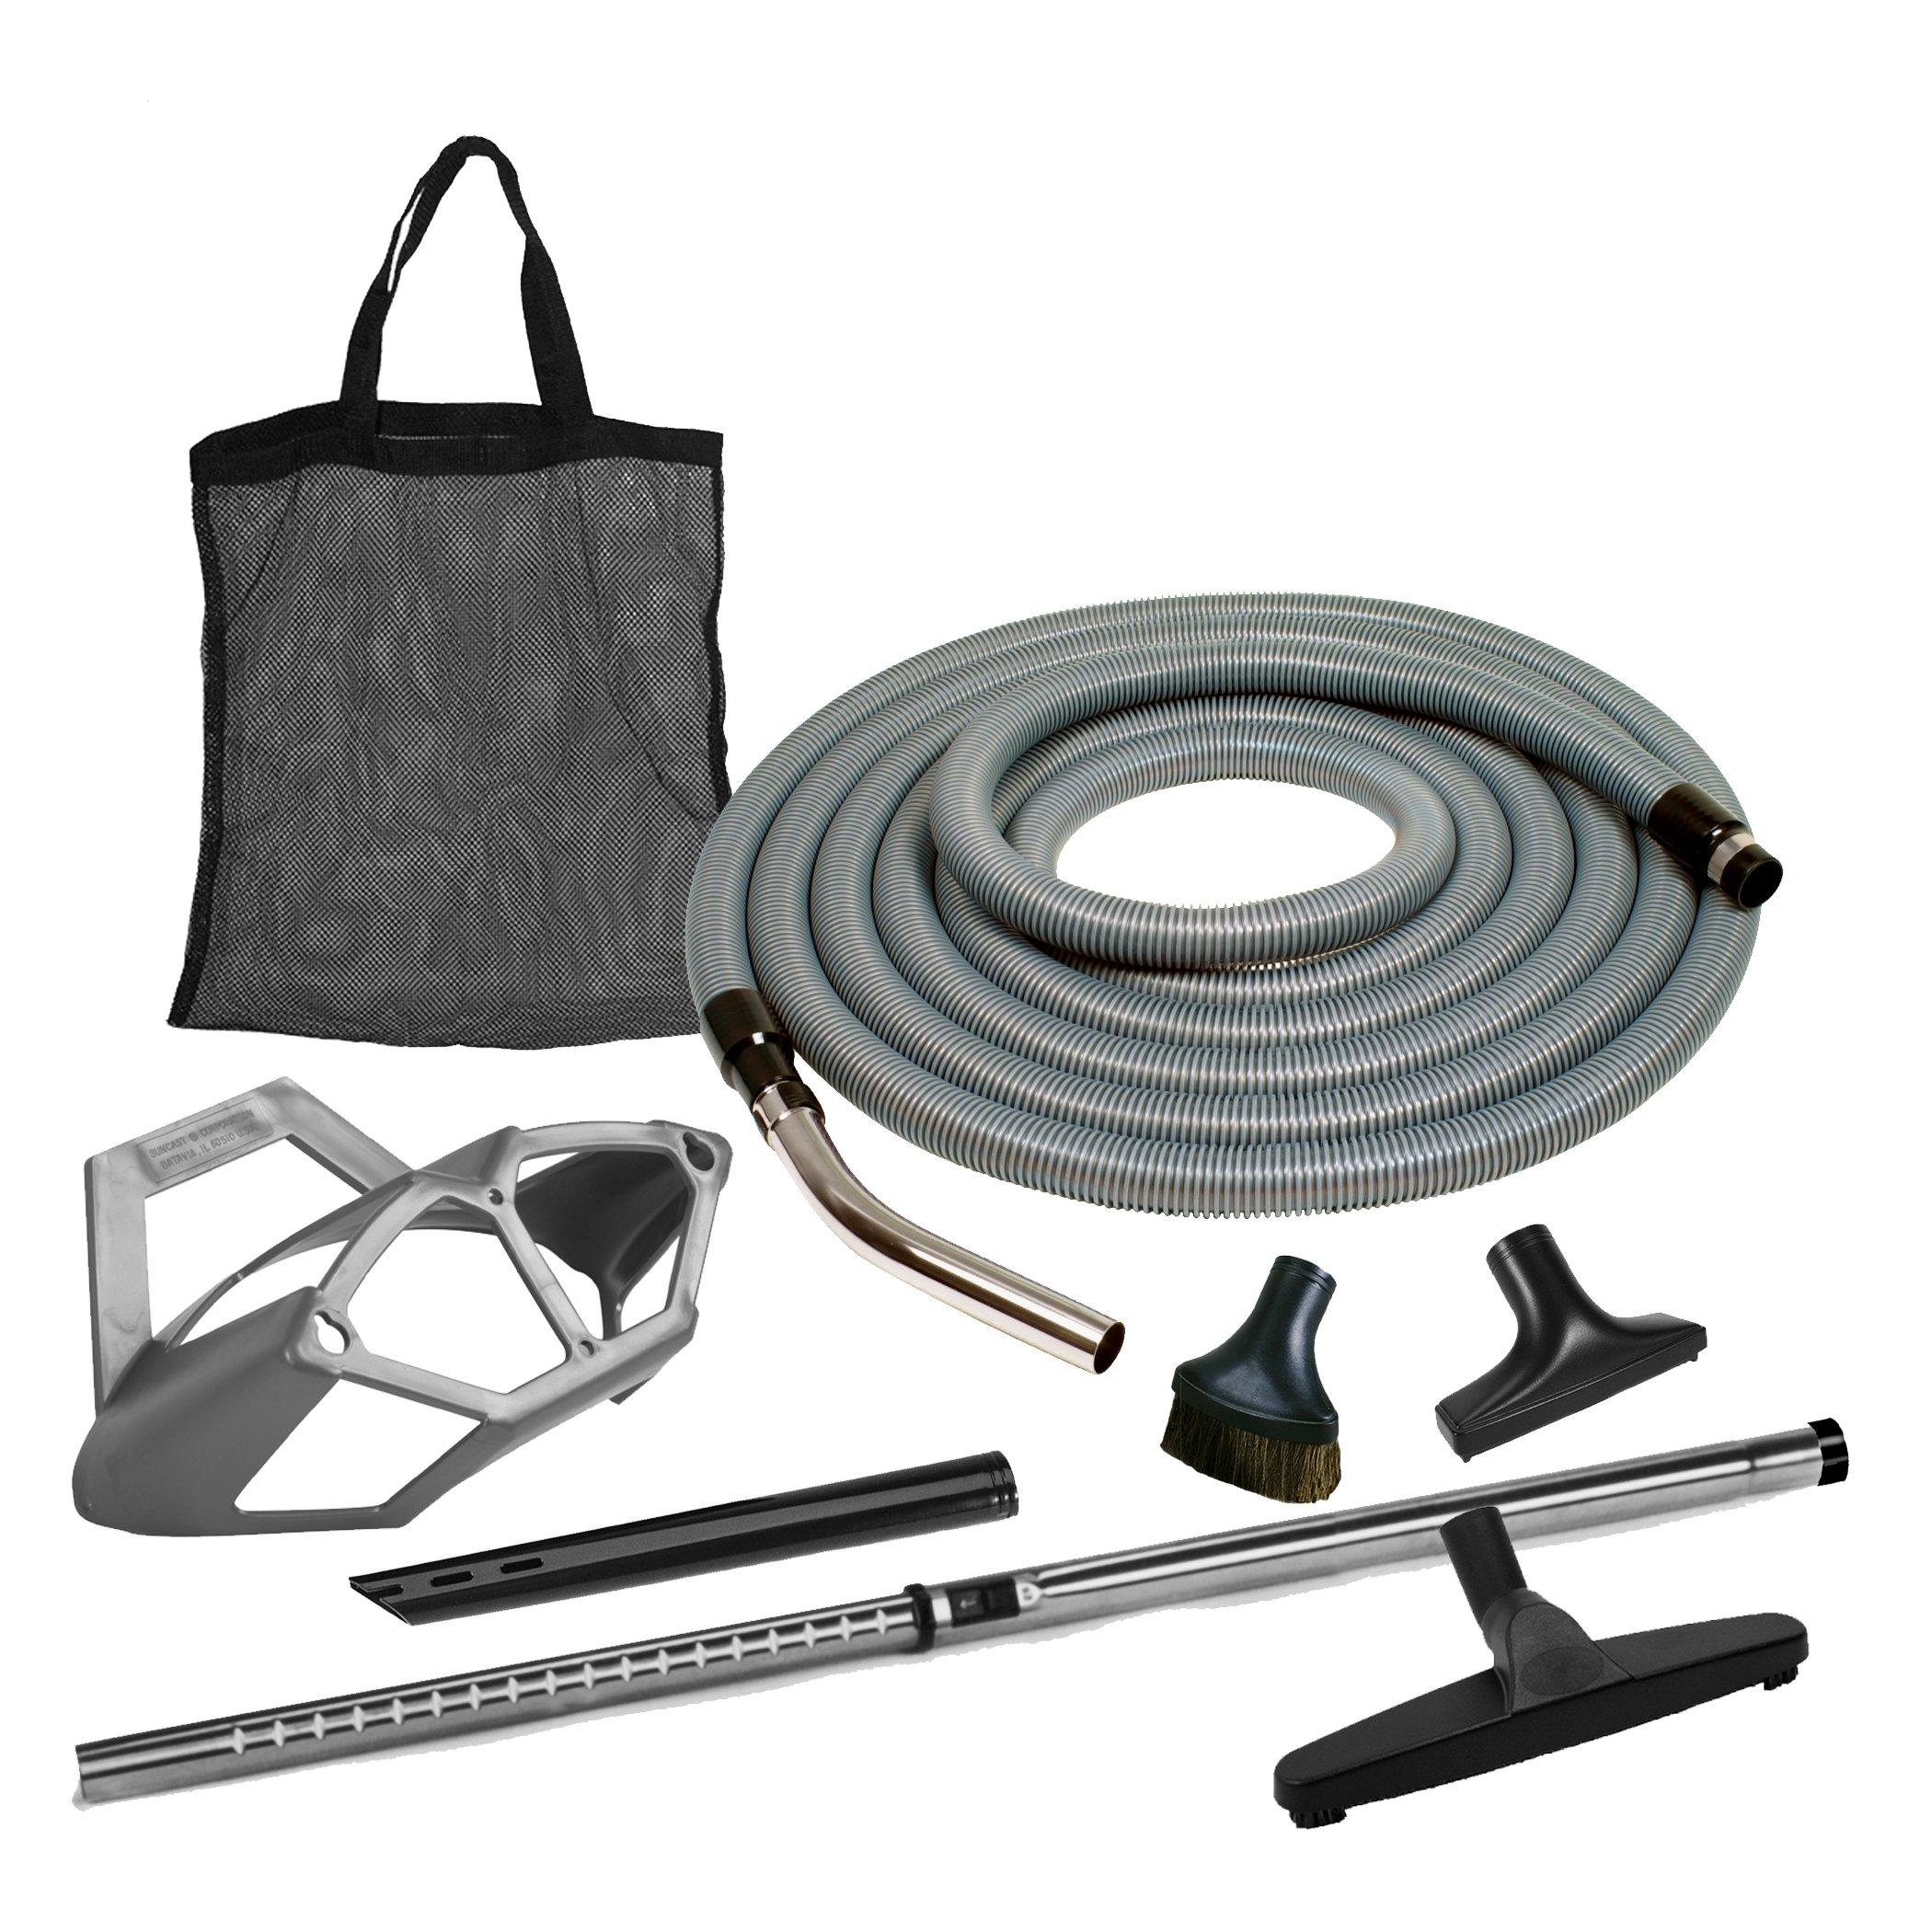 VacuMaid GKP50 Garage Kit Pro with Hose